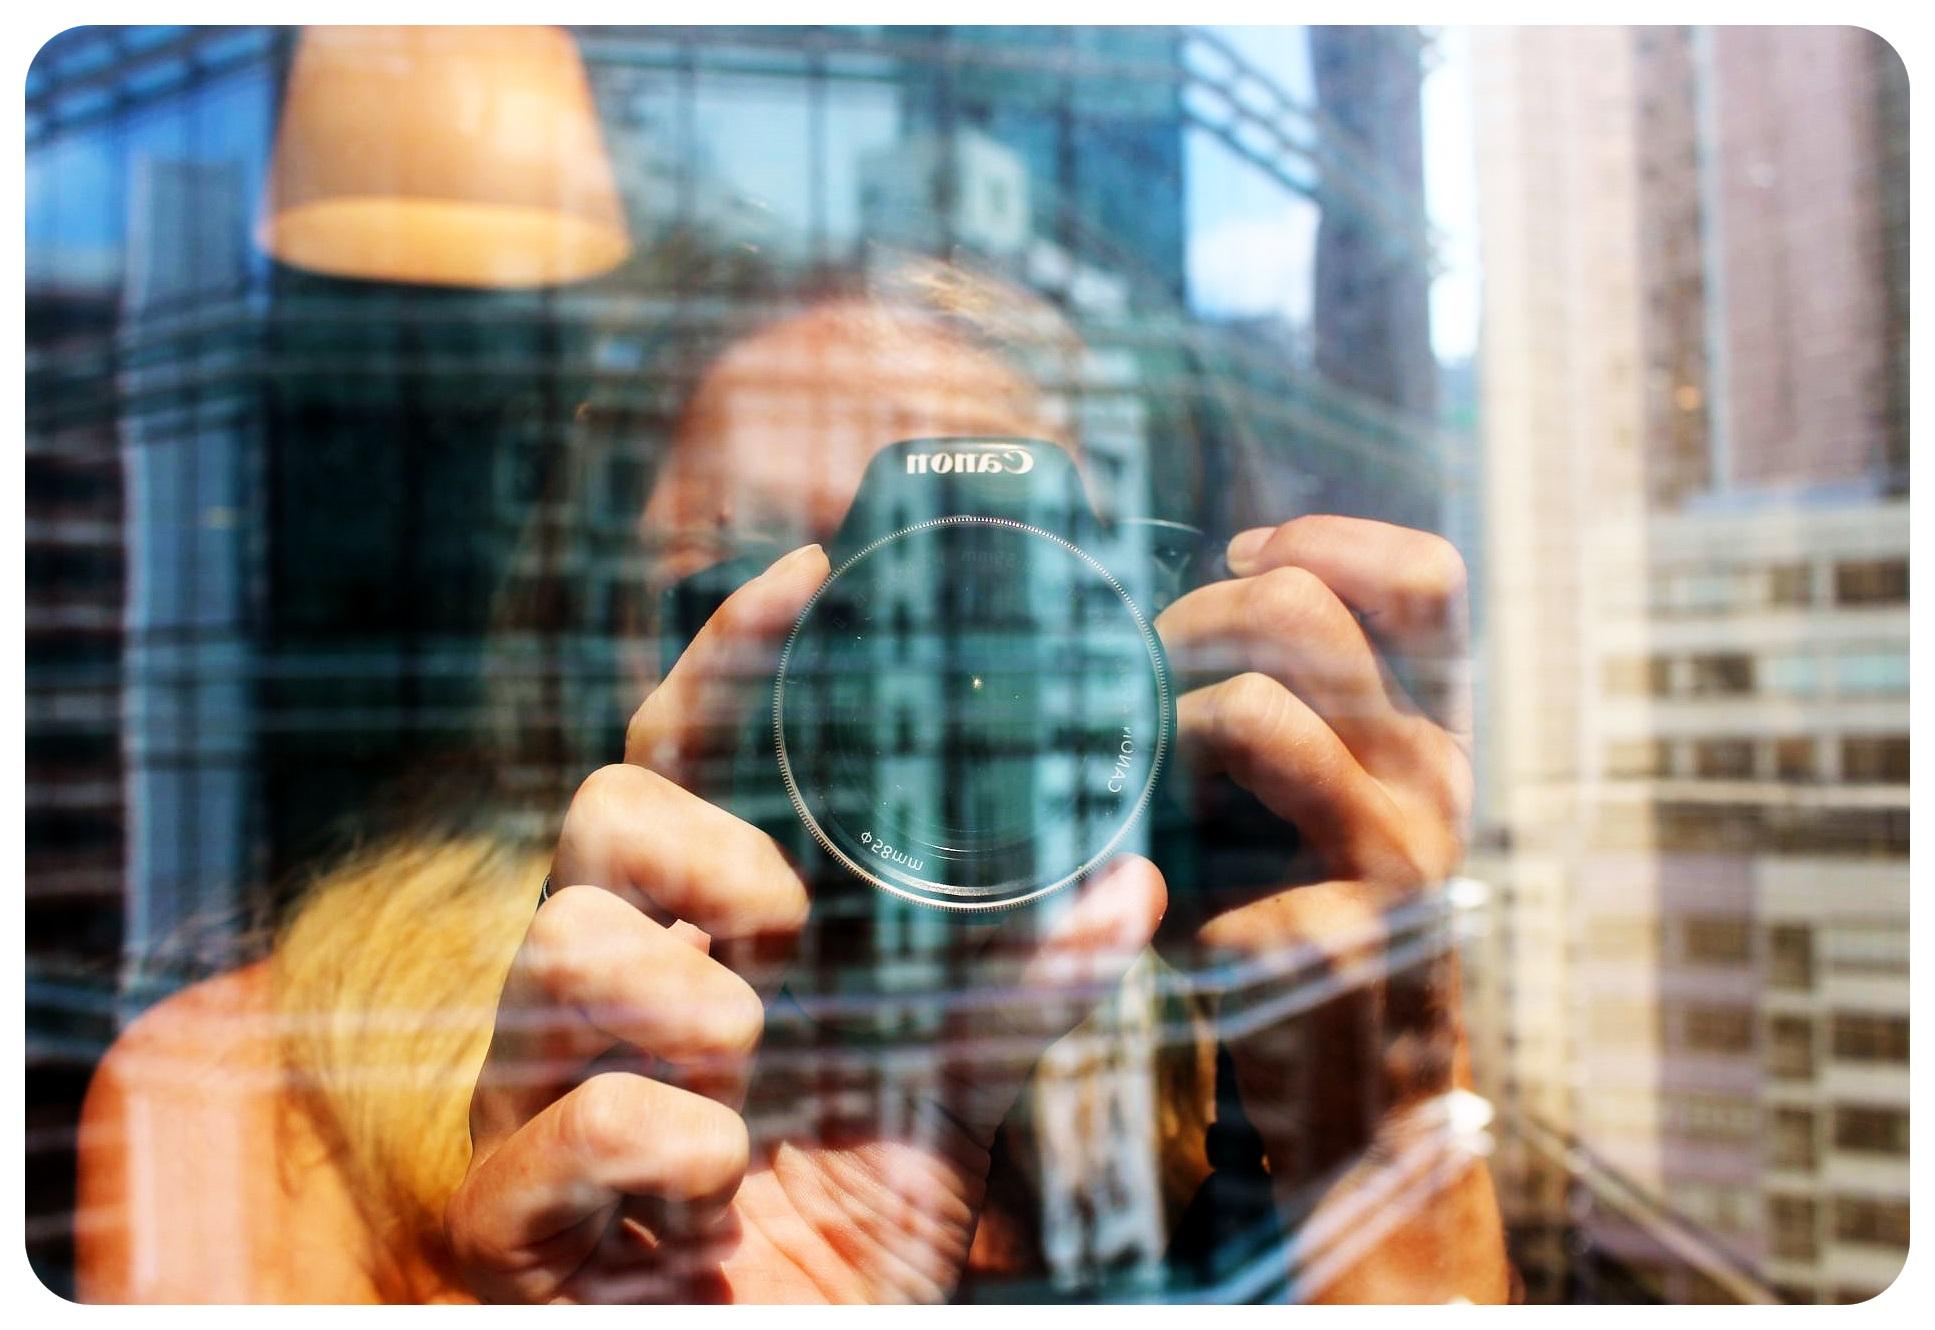 camera reflection